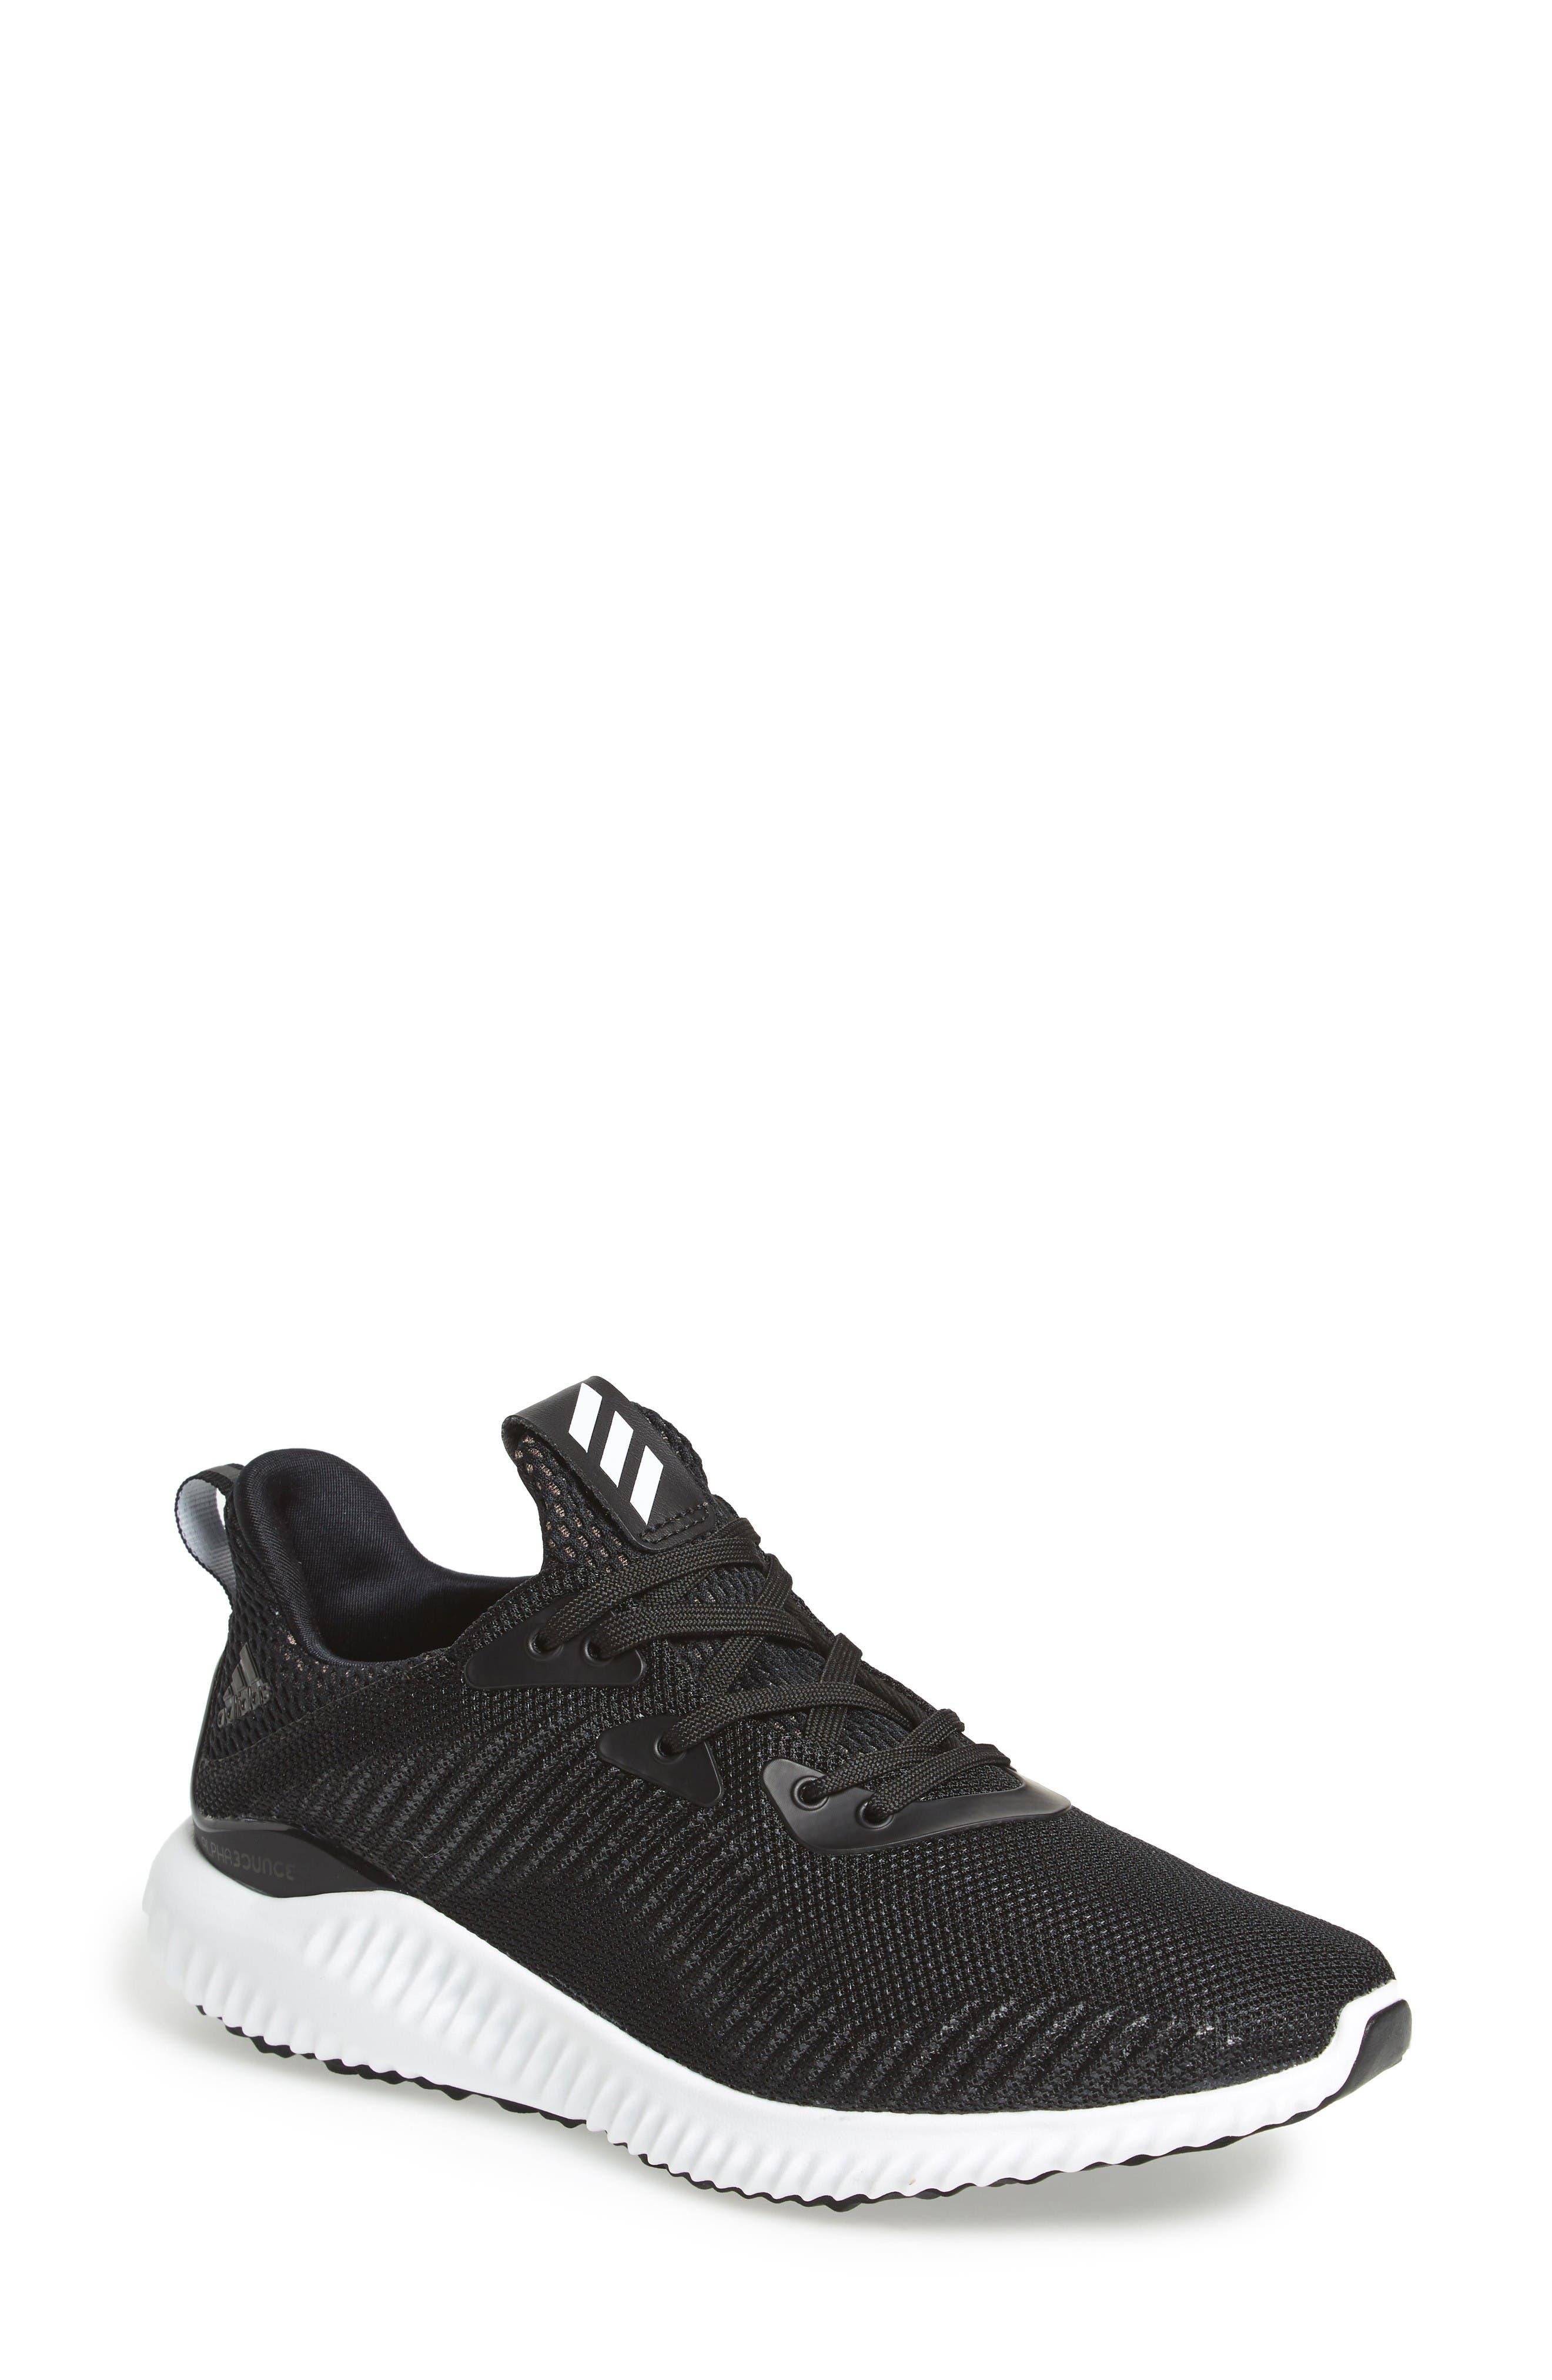 adidas AlphaBOUNCE Sneaker (Women)